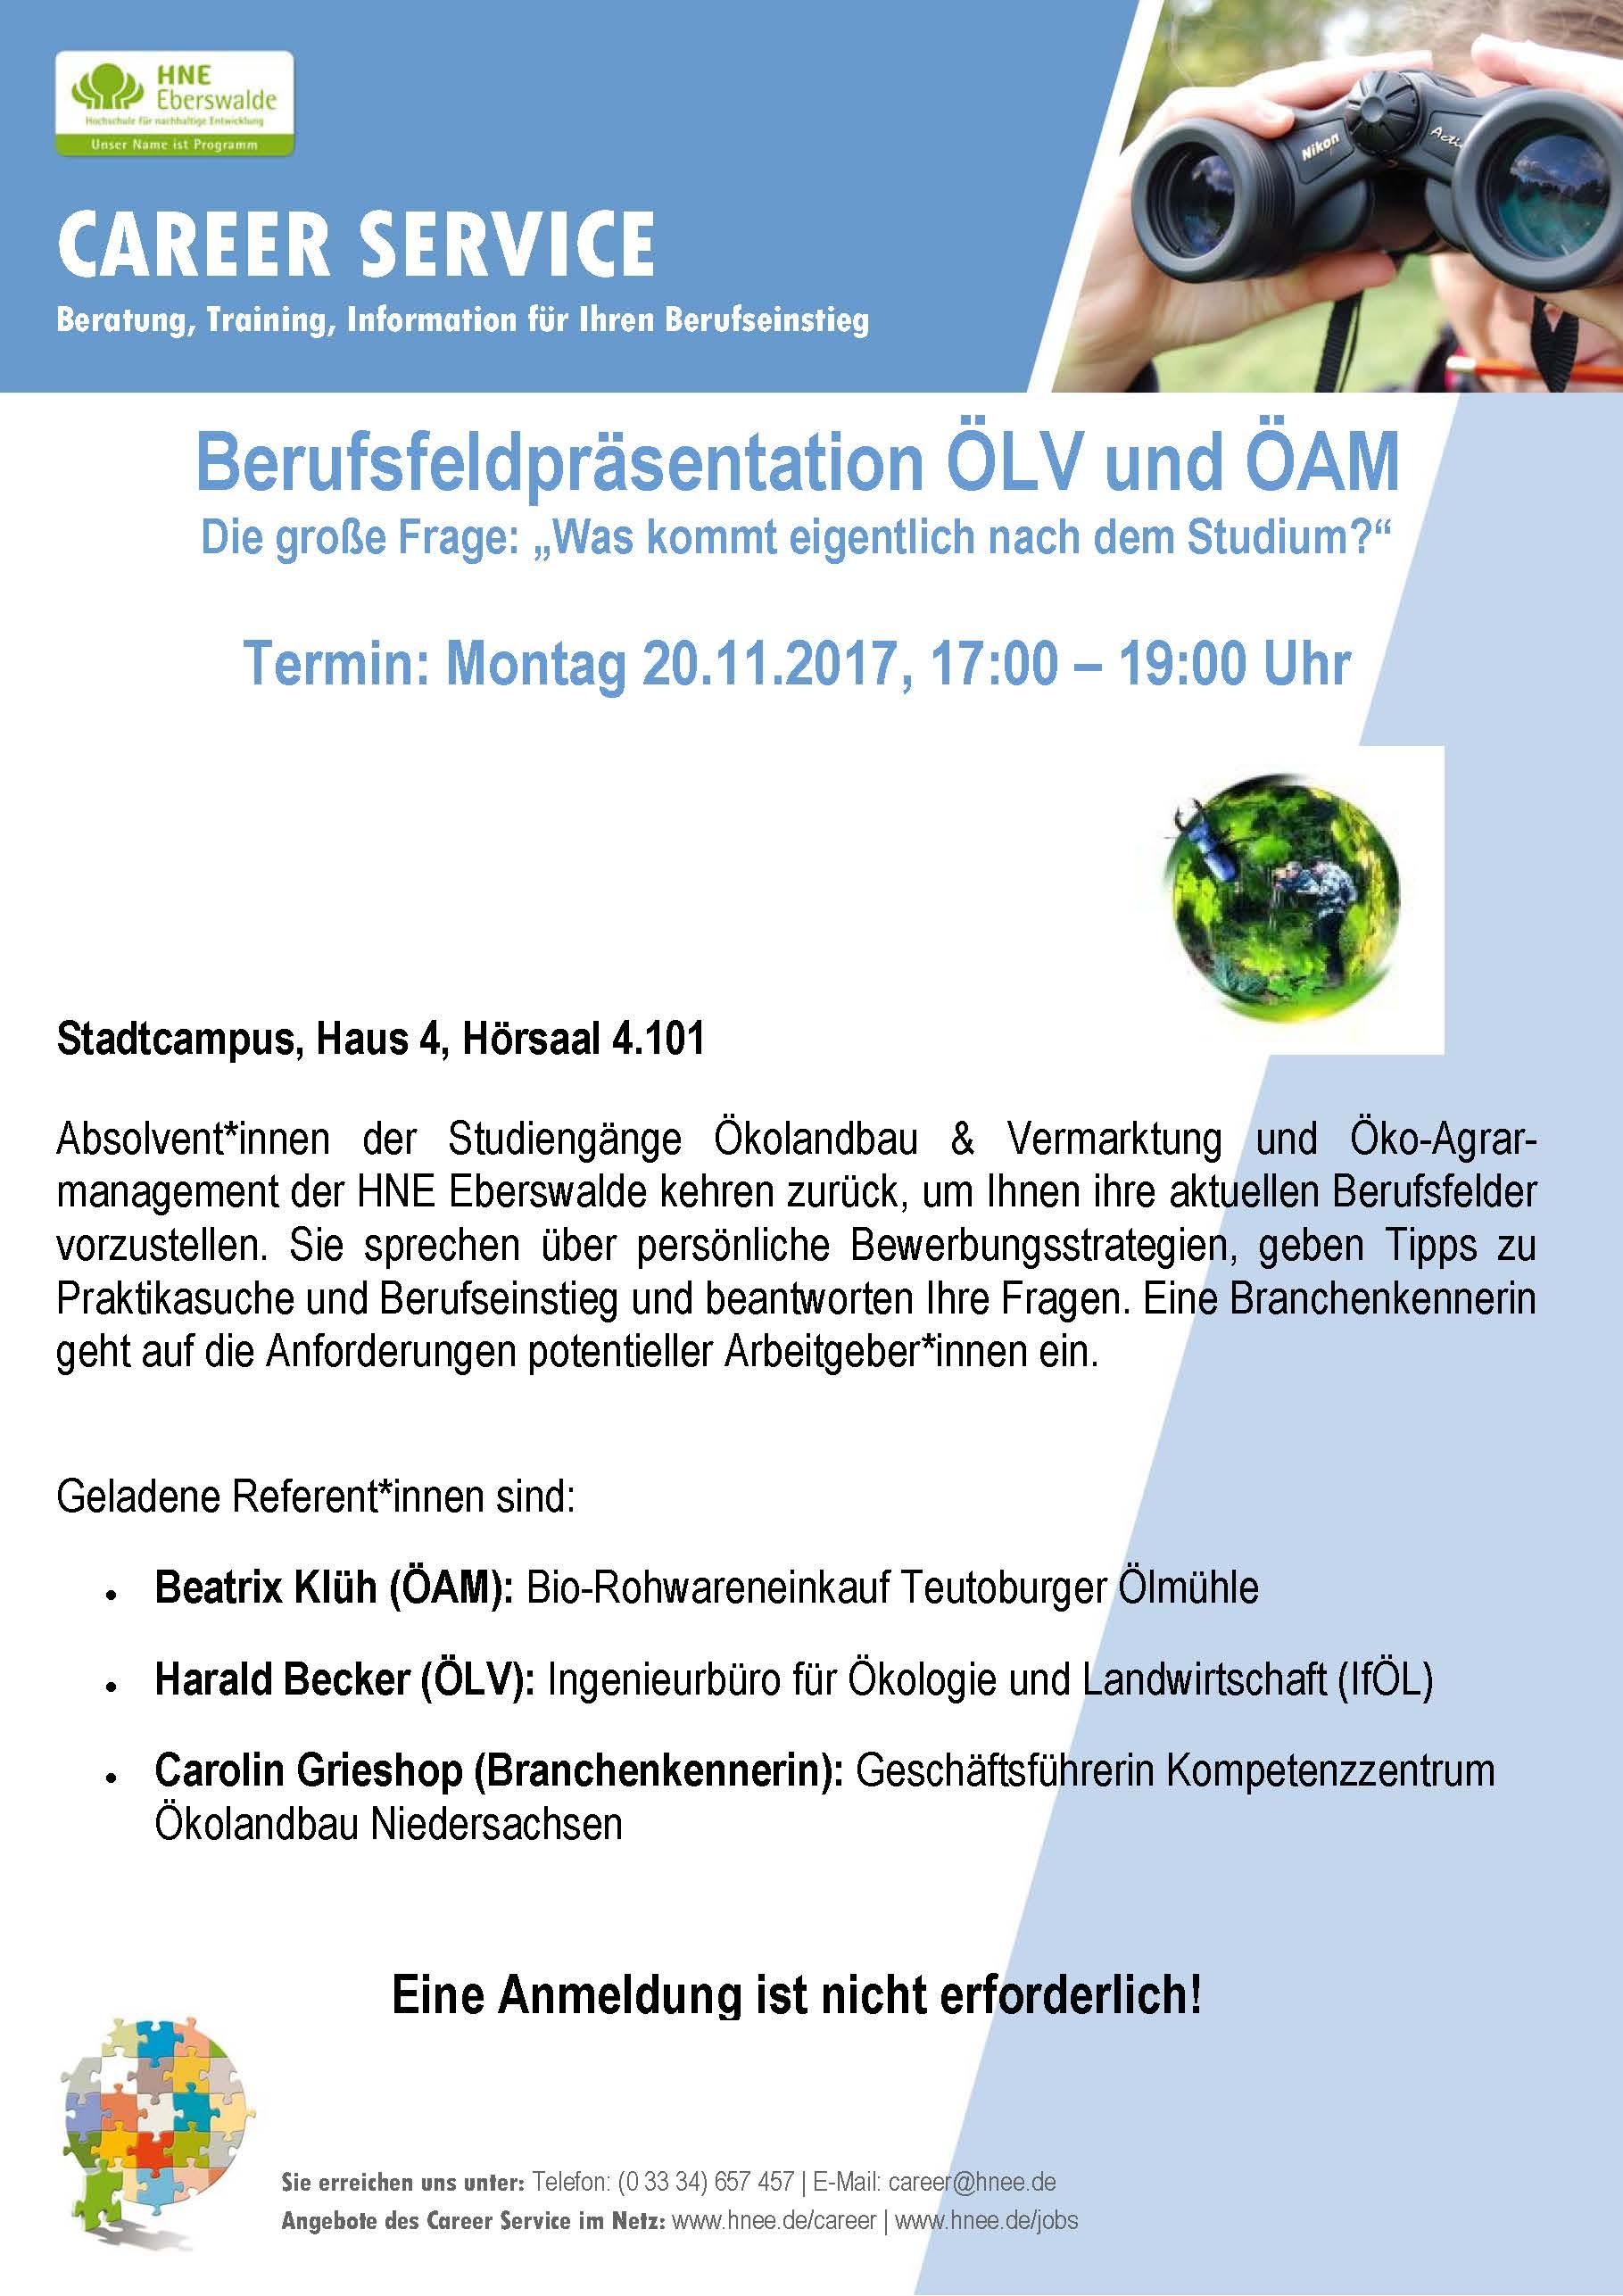 Innovationsforum ökolandbau Brandenburg Berufsfeldpräsentation Am